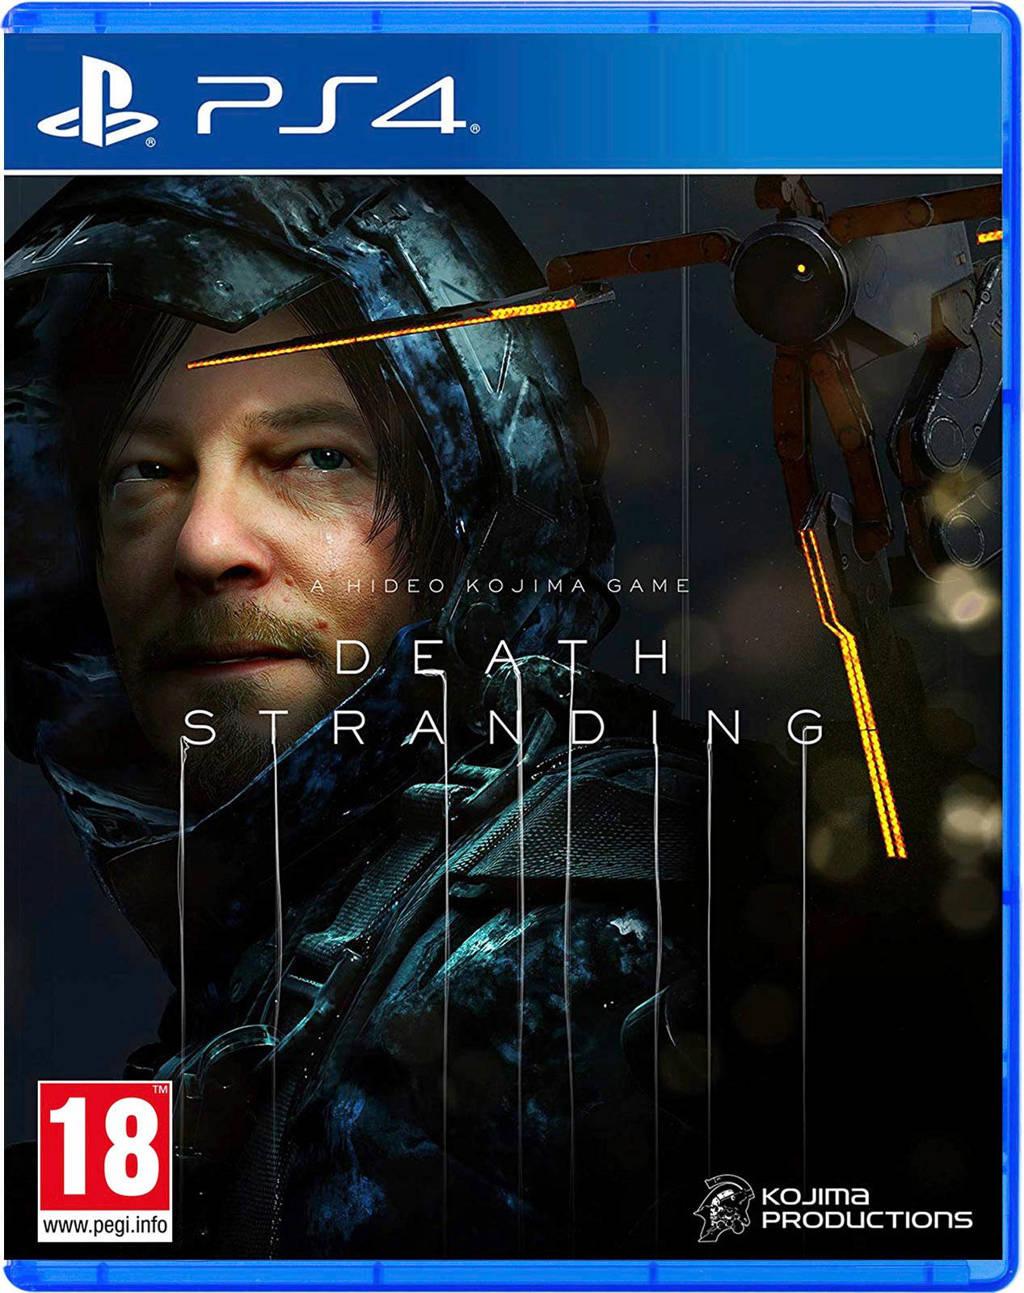 Death Stranding (PlayStation 4), N.v.t.